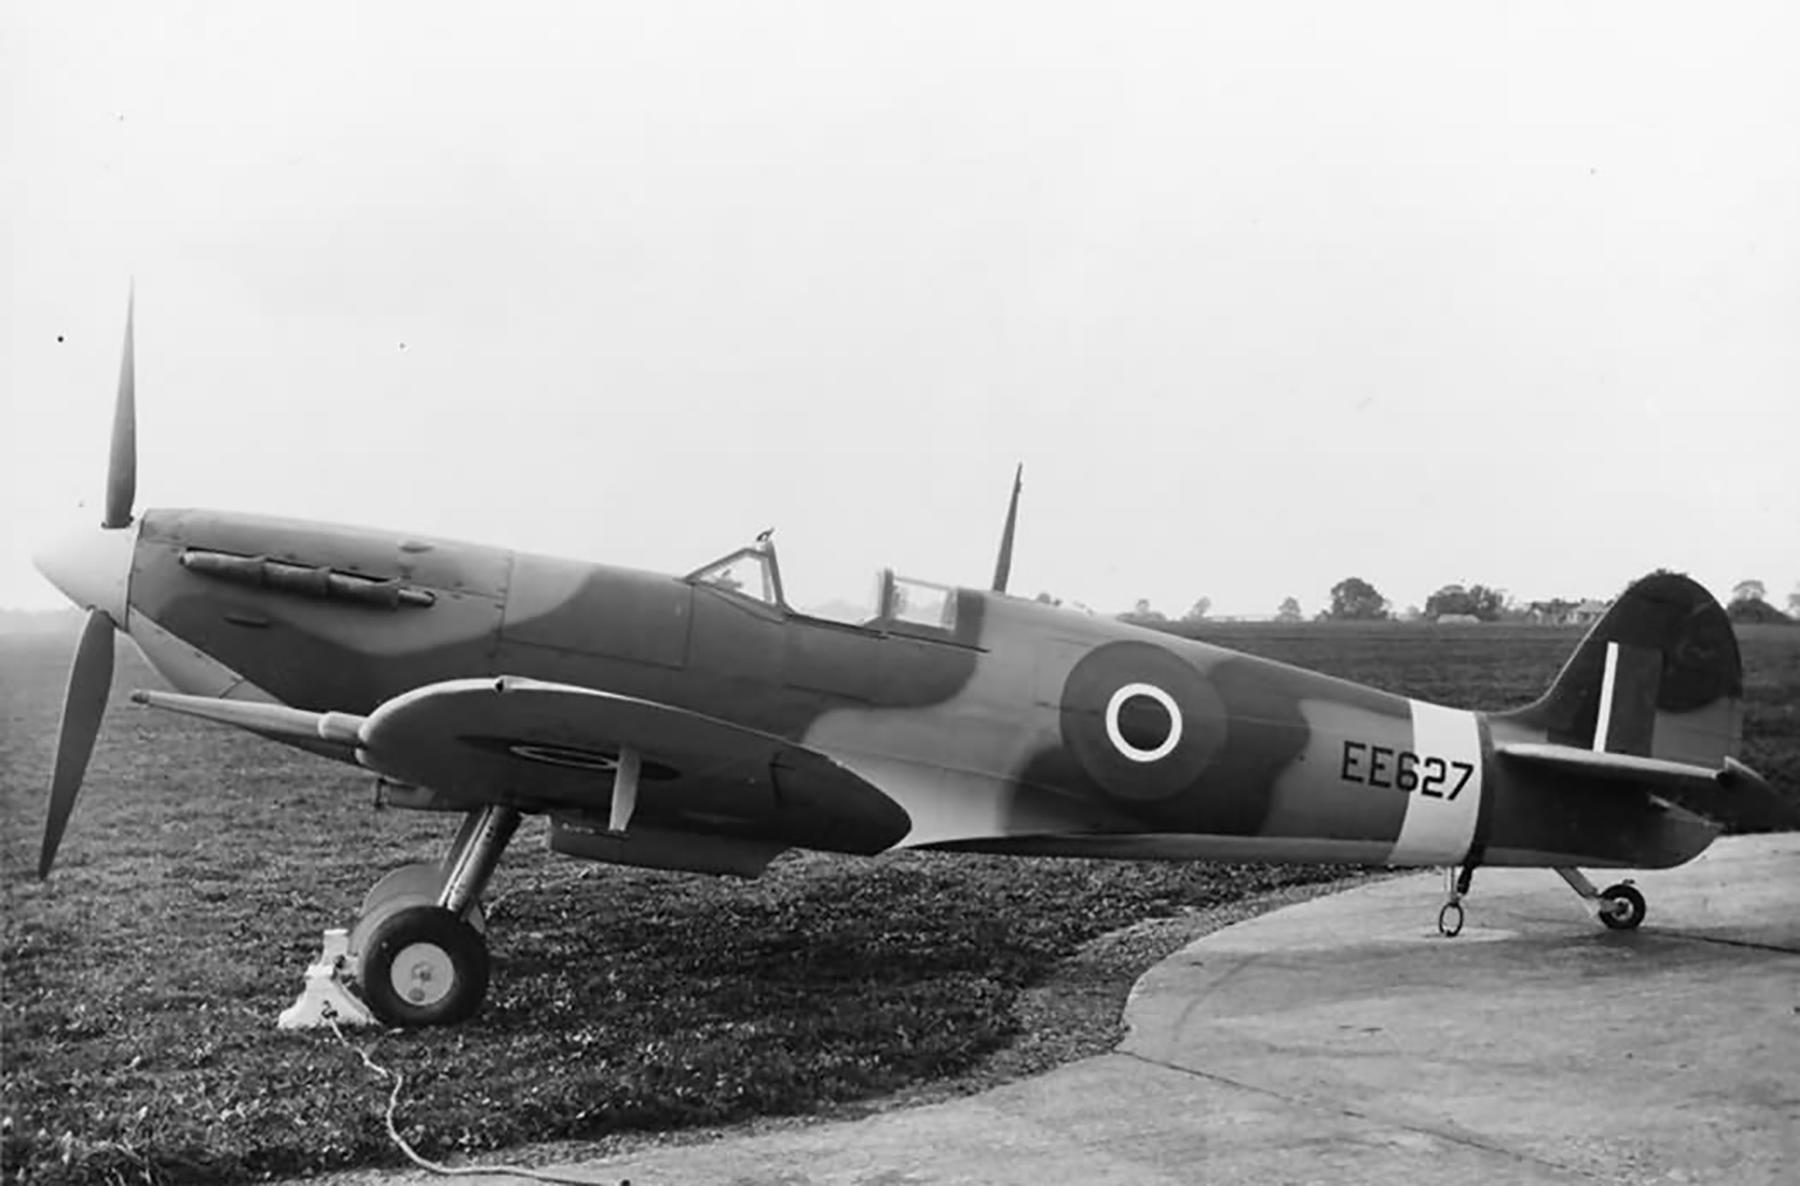 Factory fresh Spitfire MkVc RAF EE627 England web 01